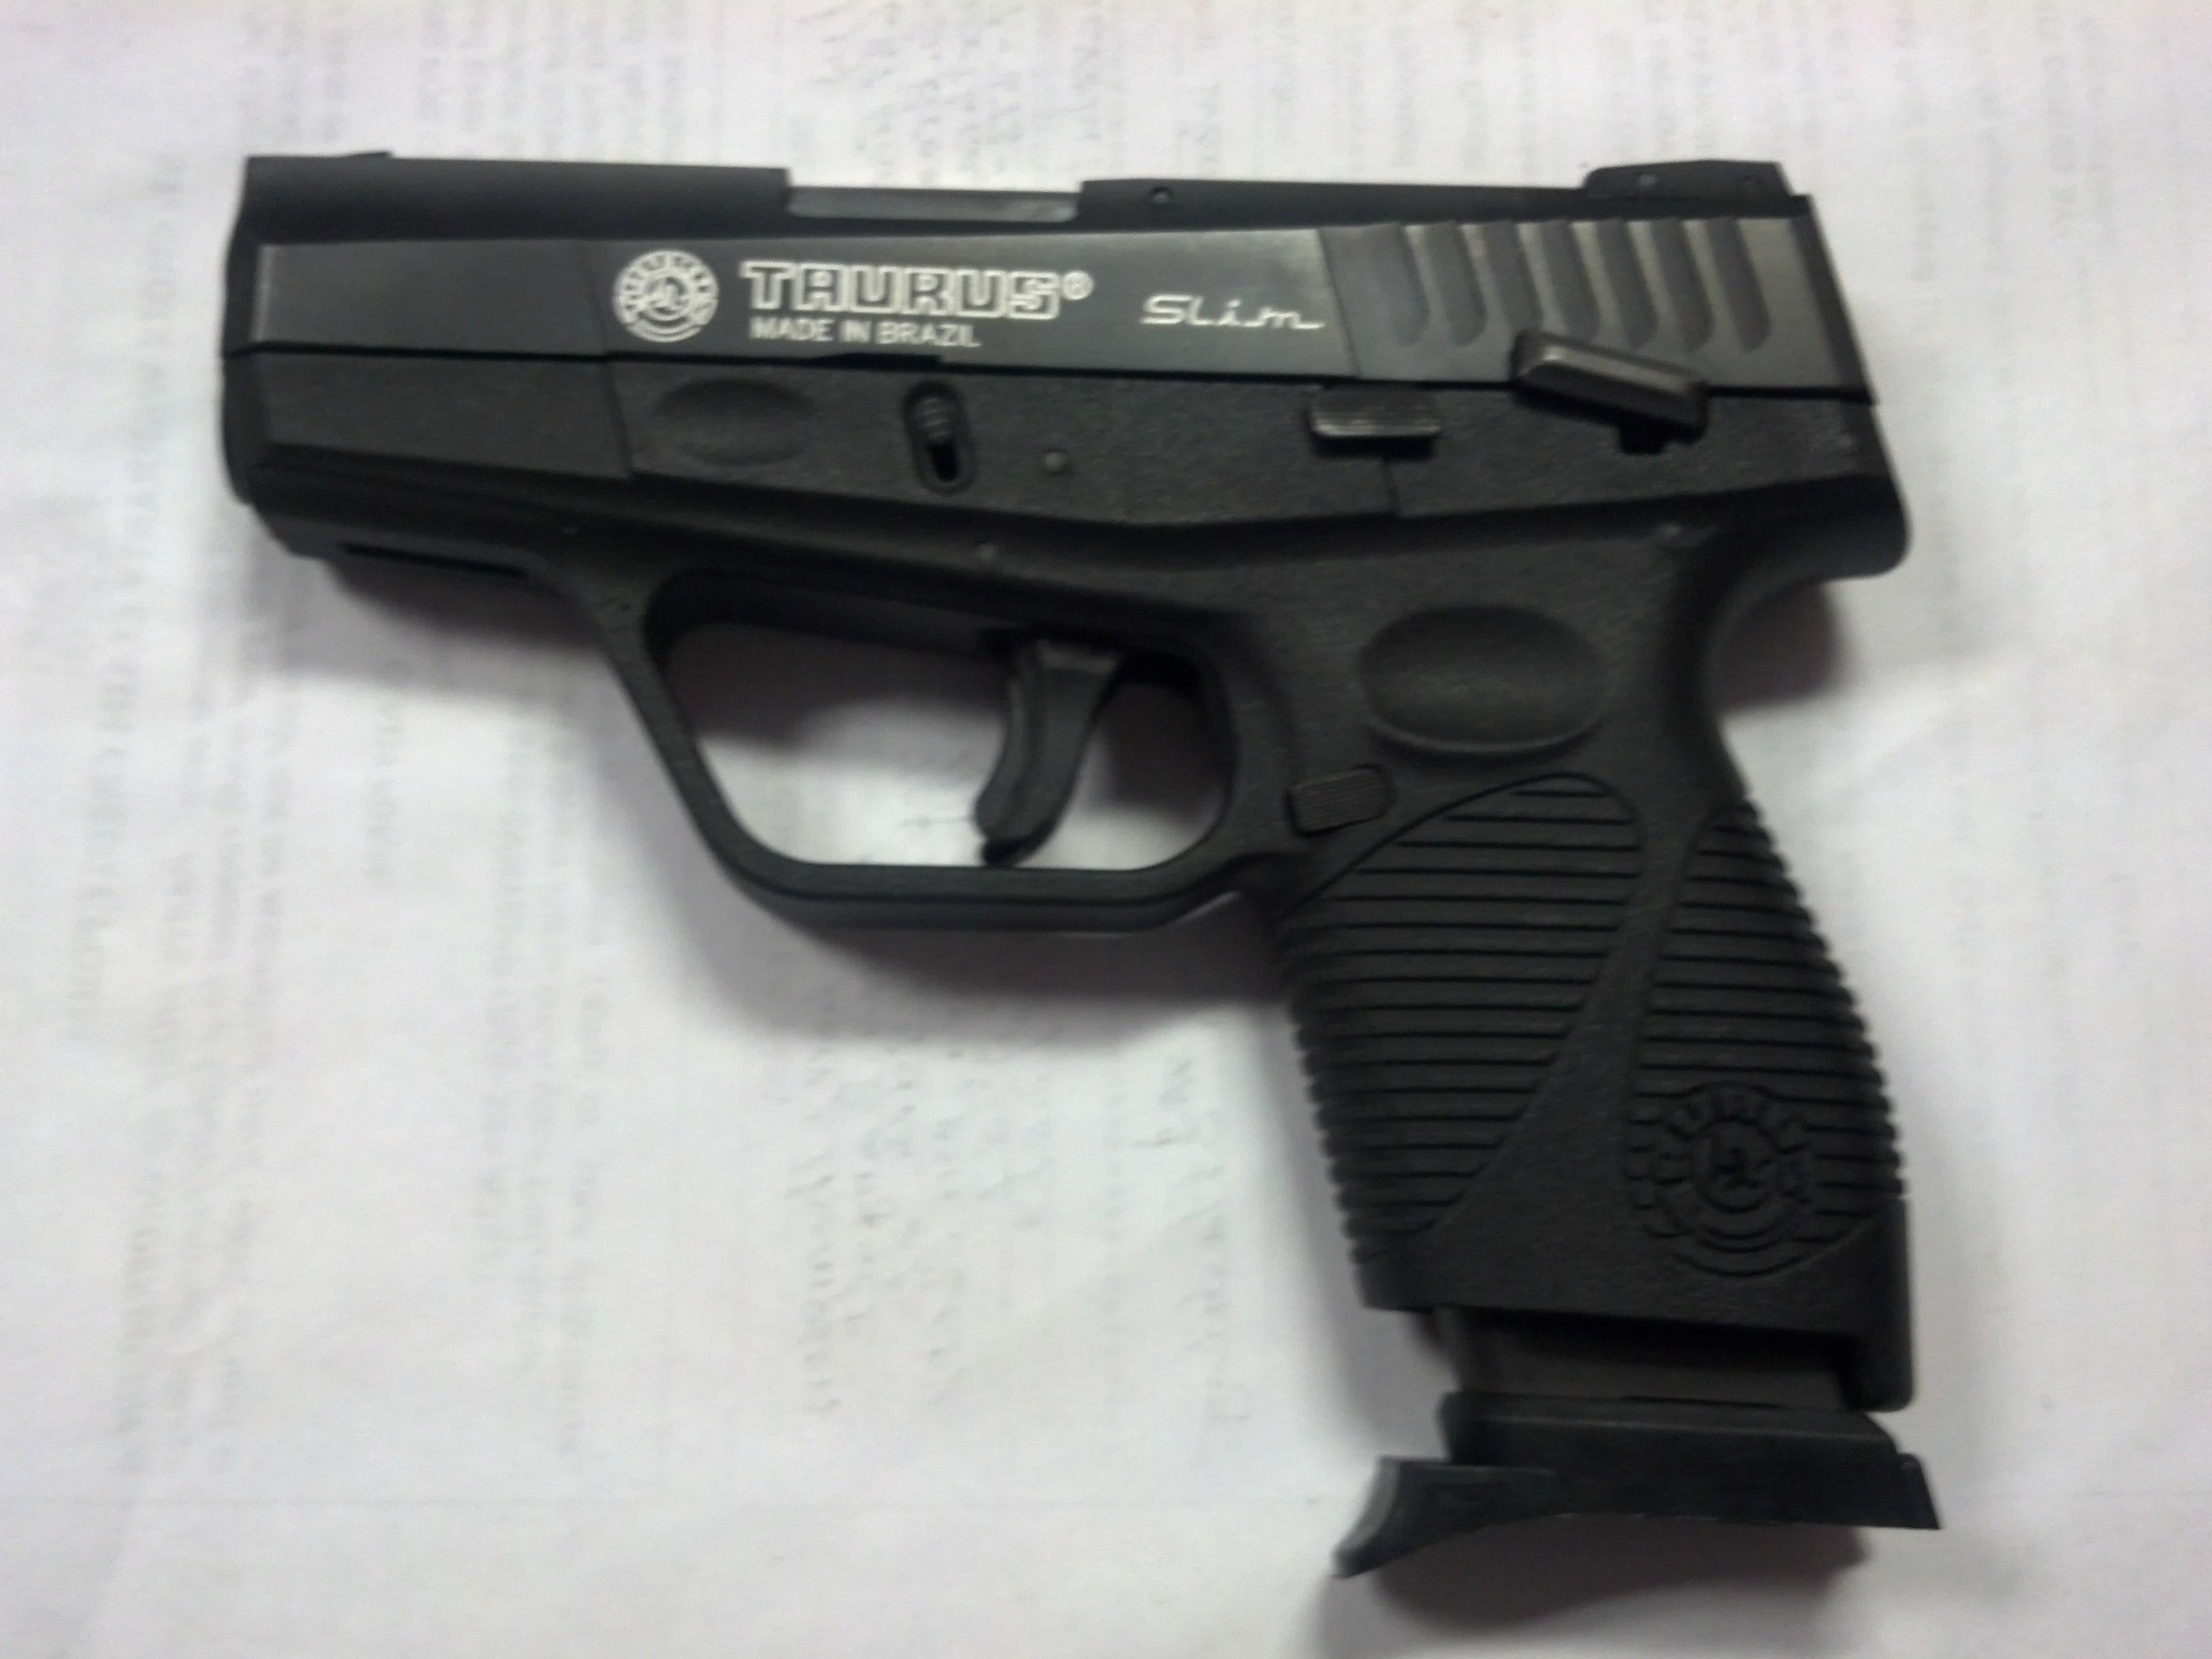 709 slim 9mm pistol - Name Img_20140217_141924_013 Jpg Views 906 Size 601 4 Kb